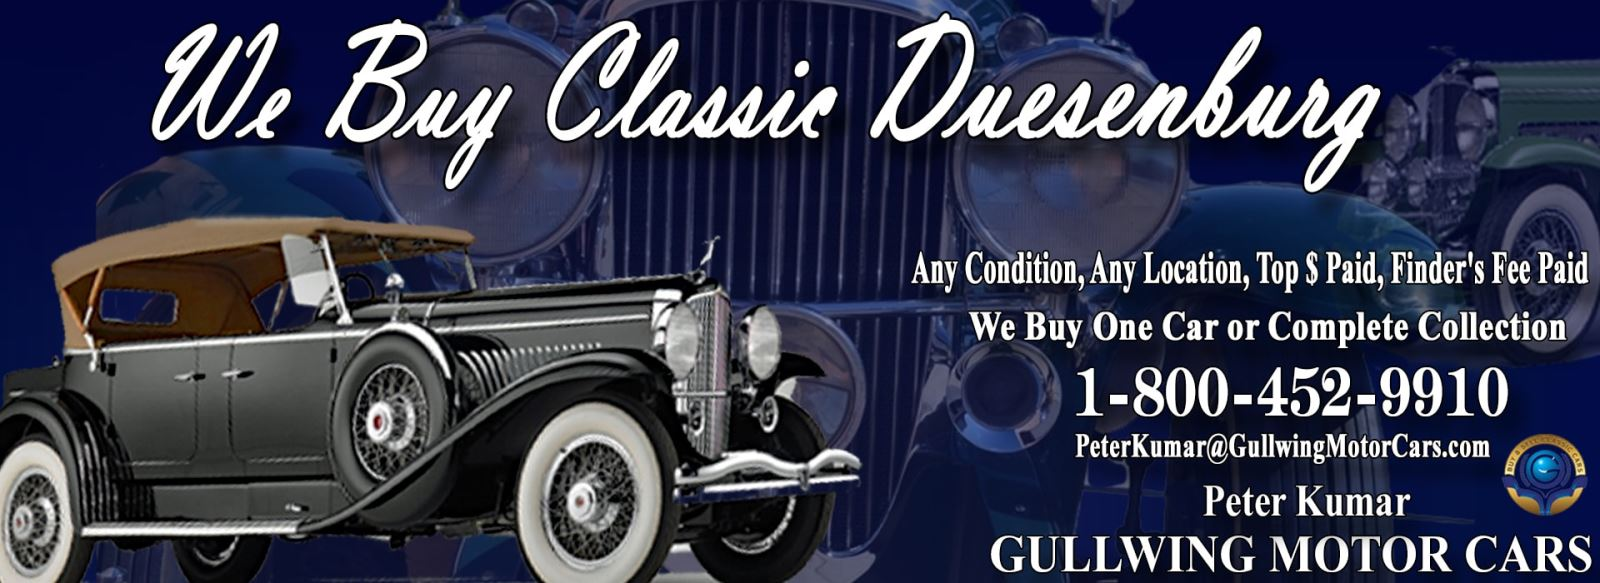 Classic Duesenburg for sale, we buy vintage Duesenburg. Call Peter Kumar. Gullwing Motor